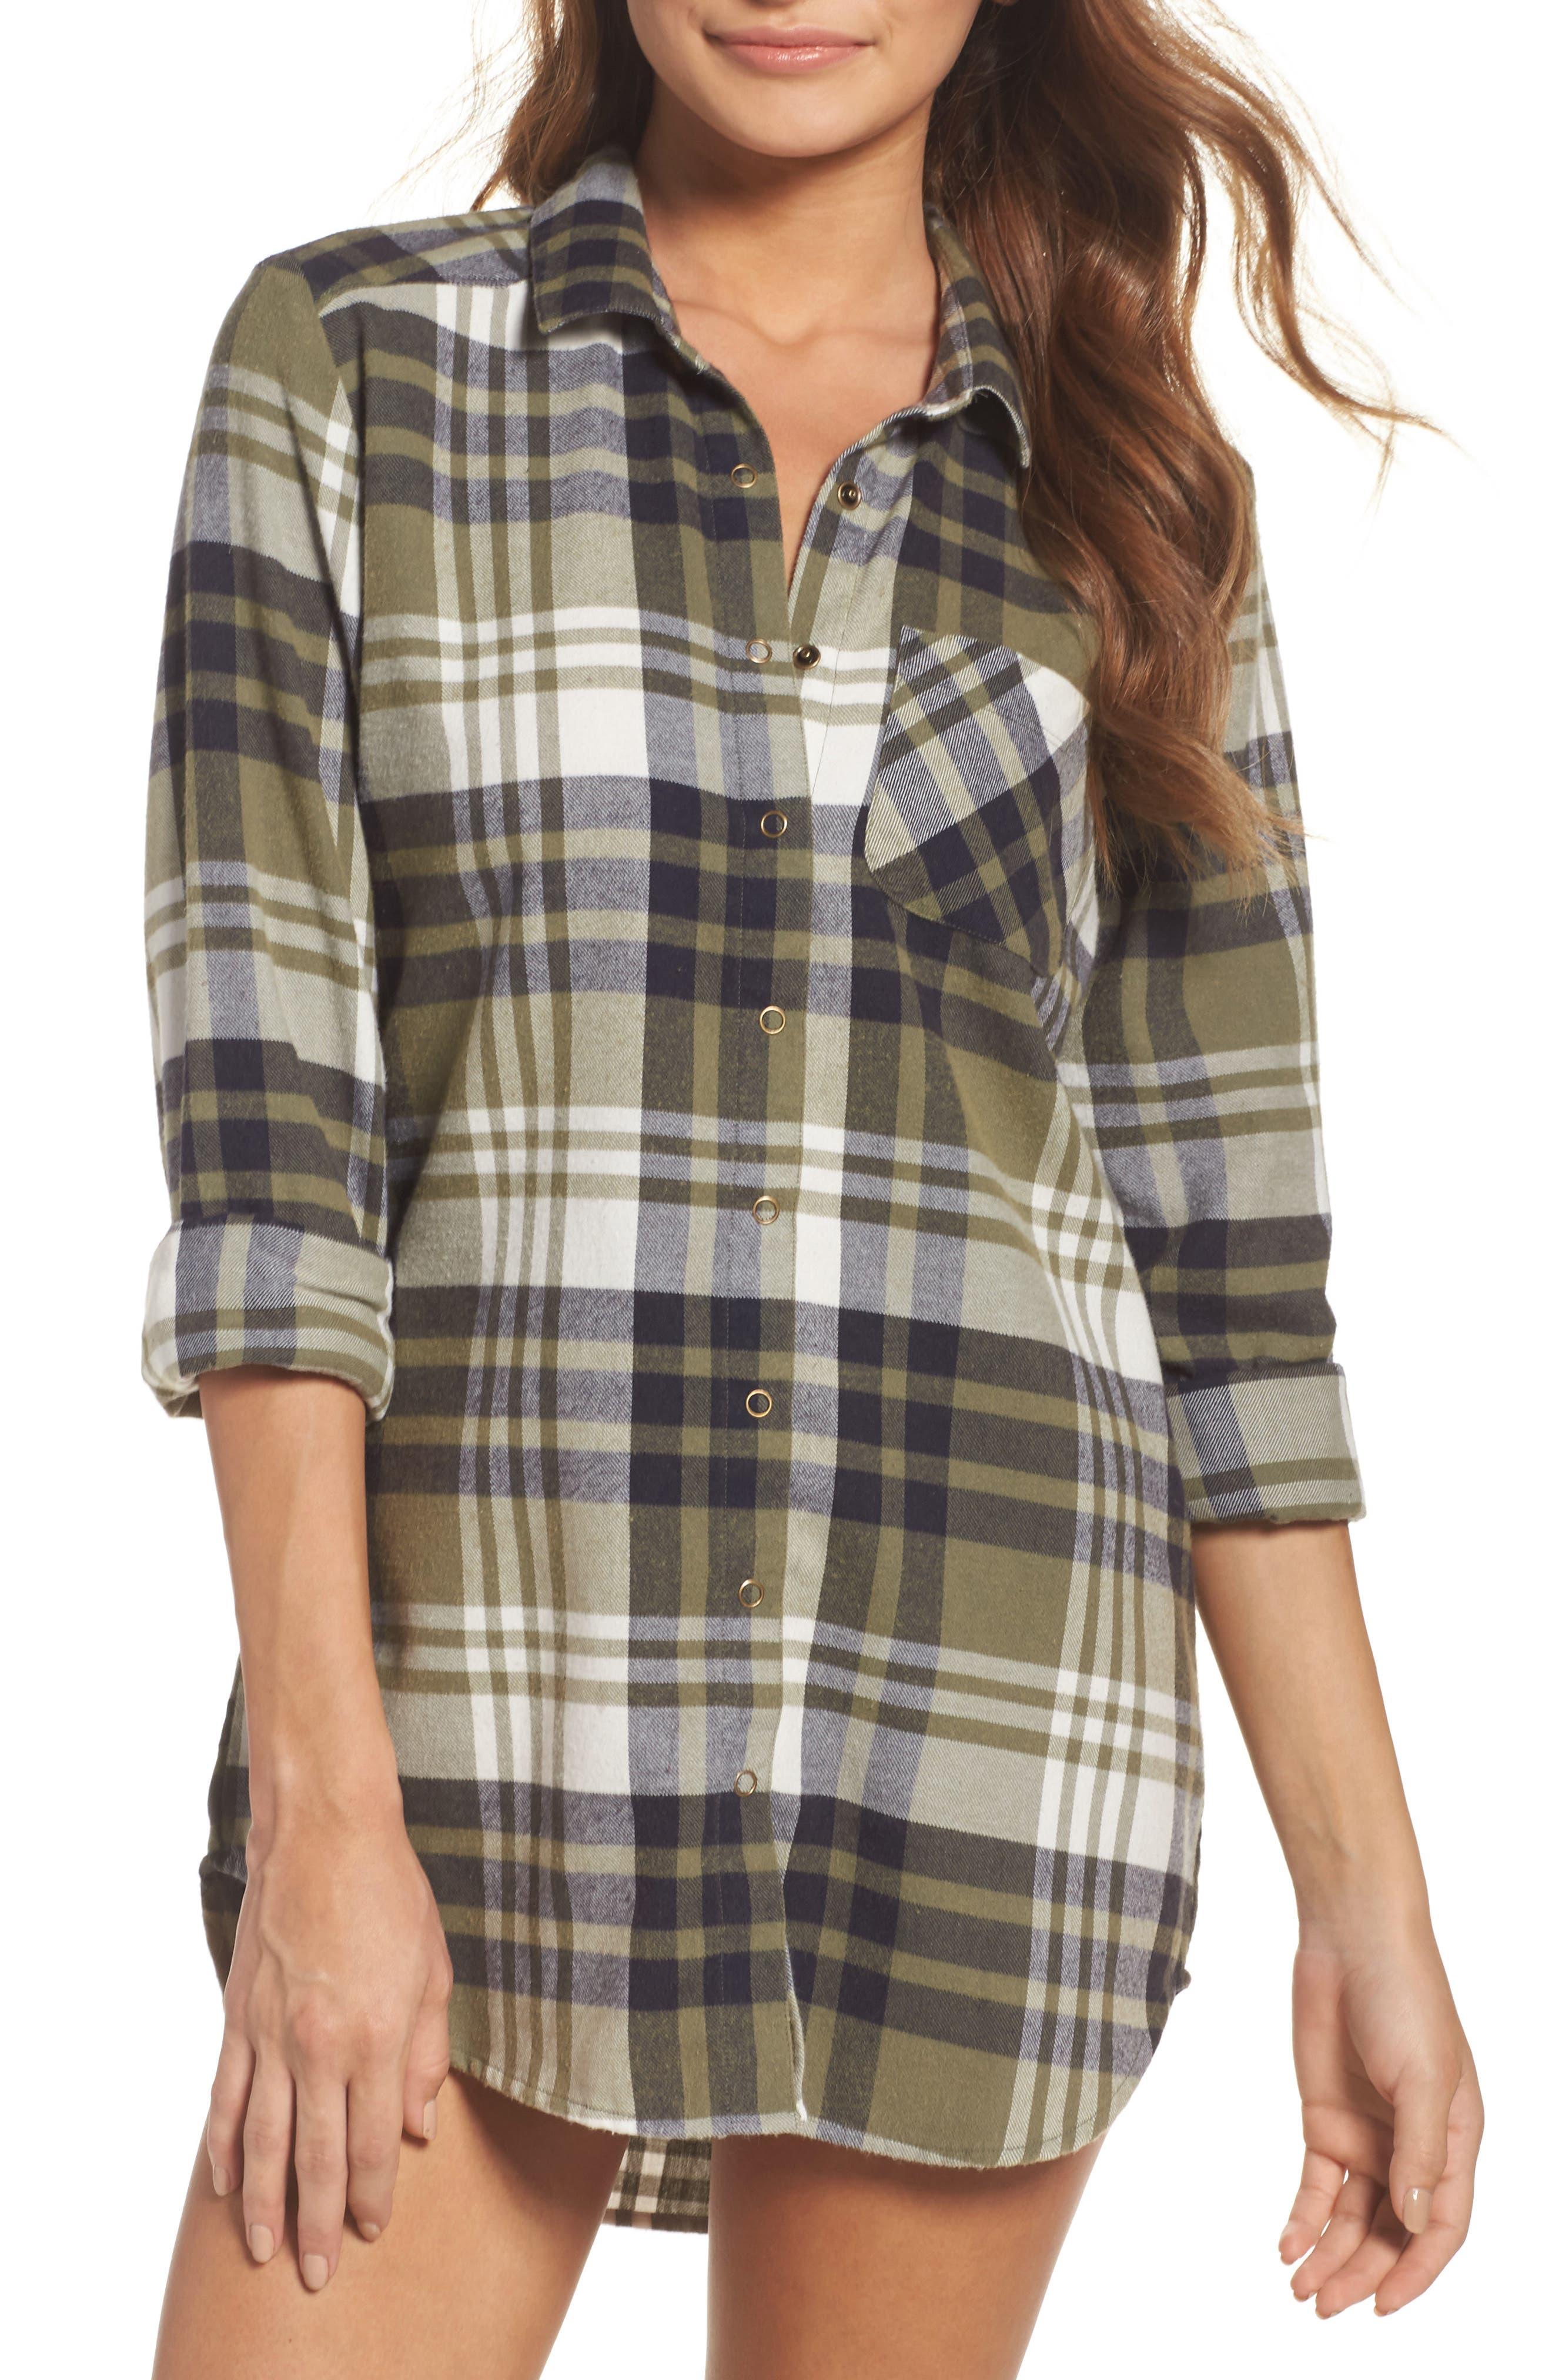 Alternate Image 1 Selected - Make + Model Plaid Cotton Blend Nightshirt